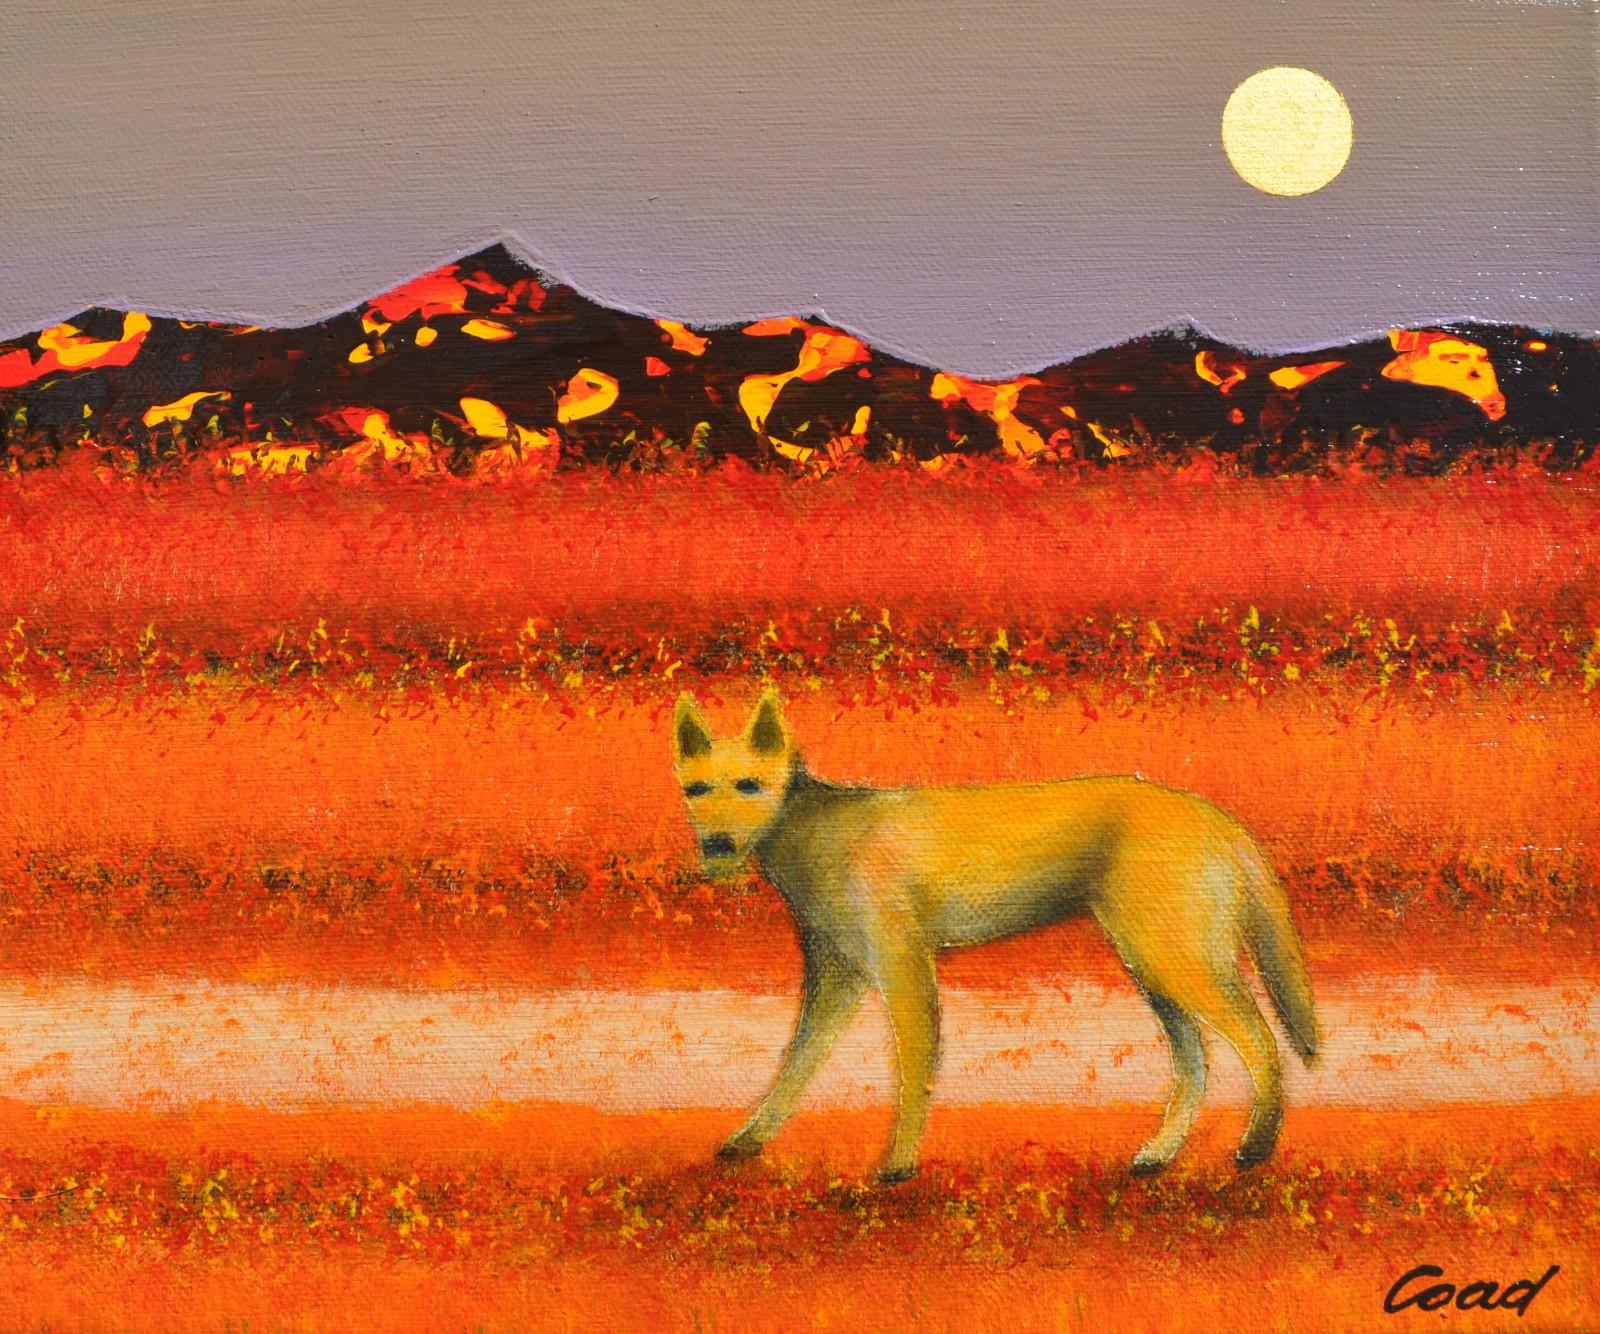 Peter Coad 'Dingo and Moon' 25cm x 30cm #14538